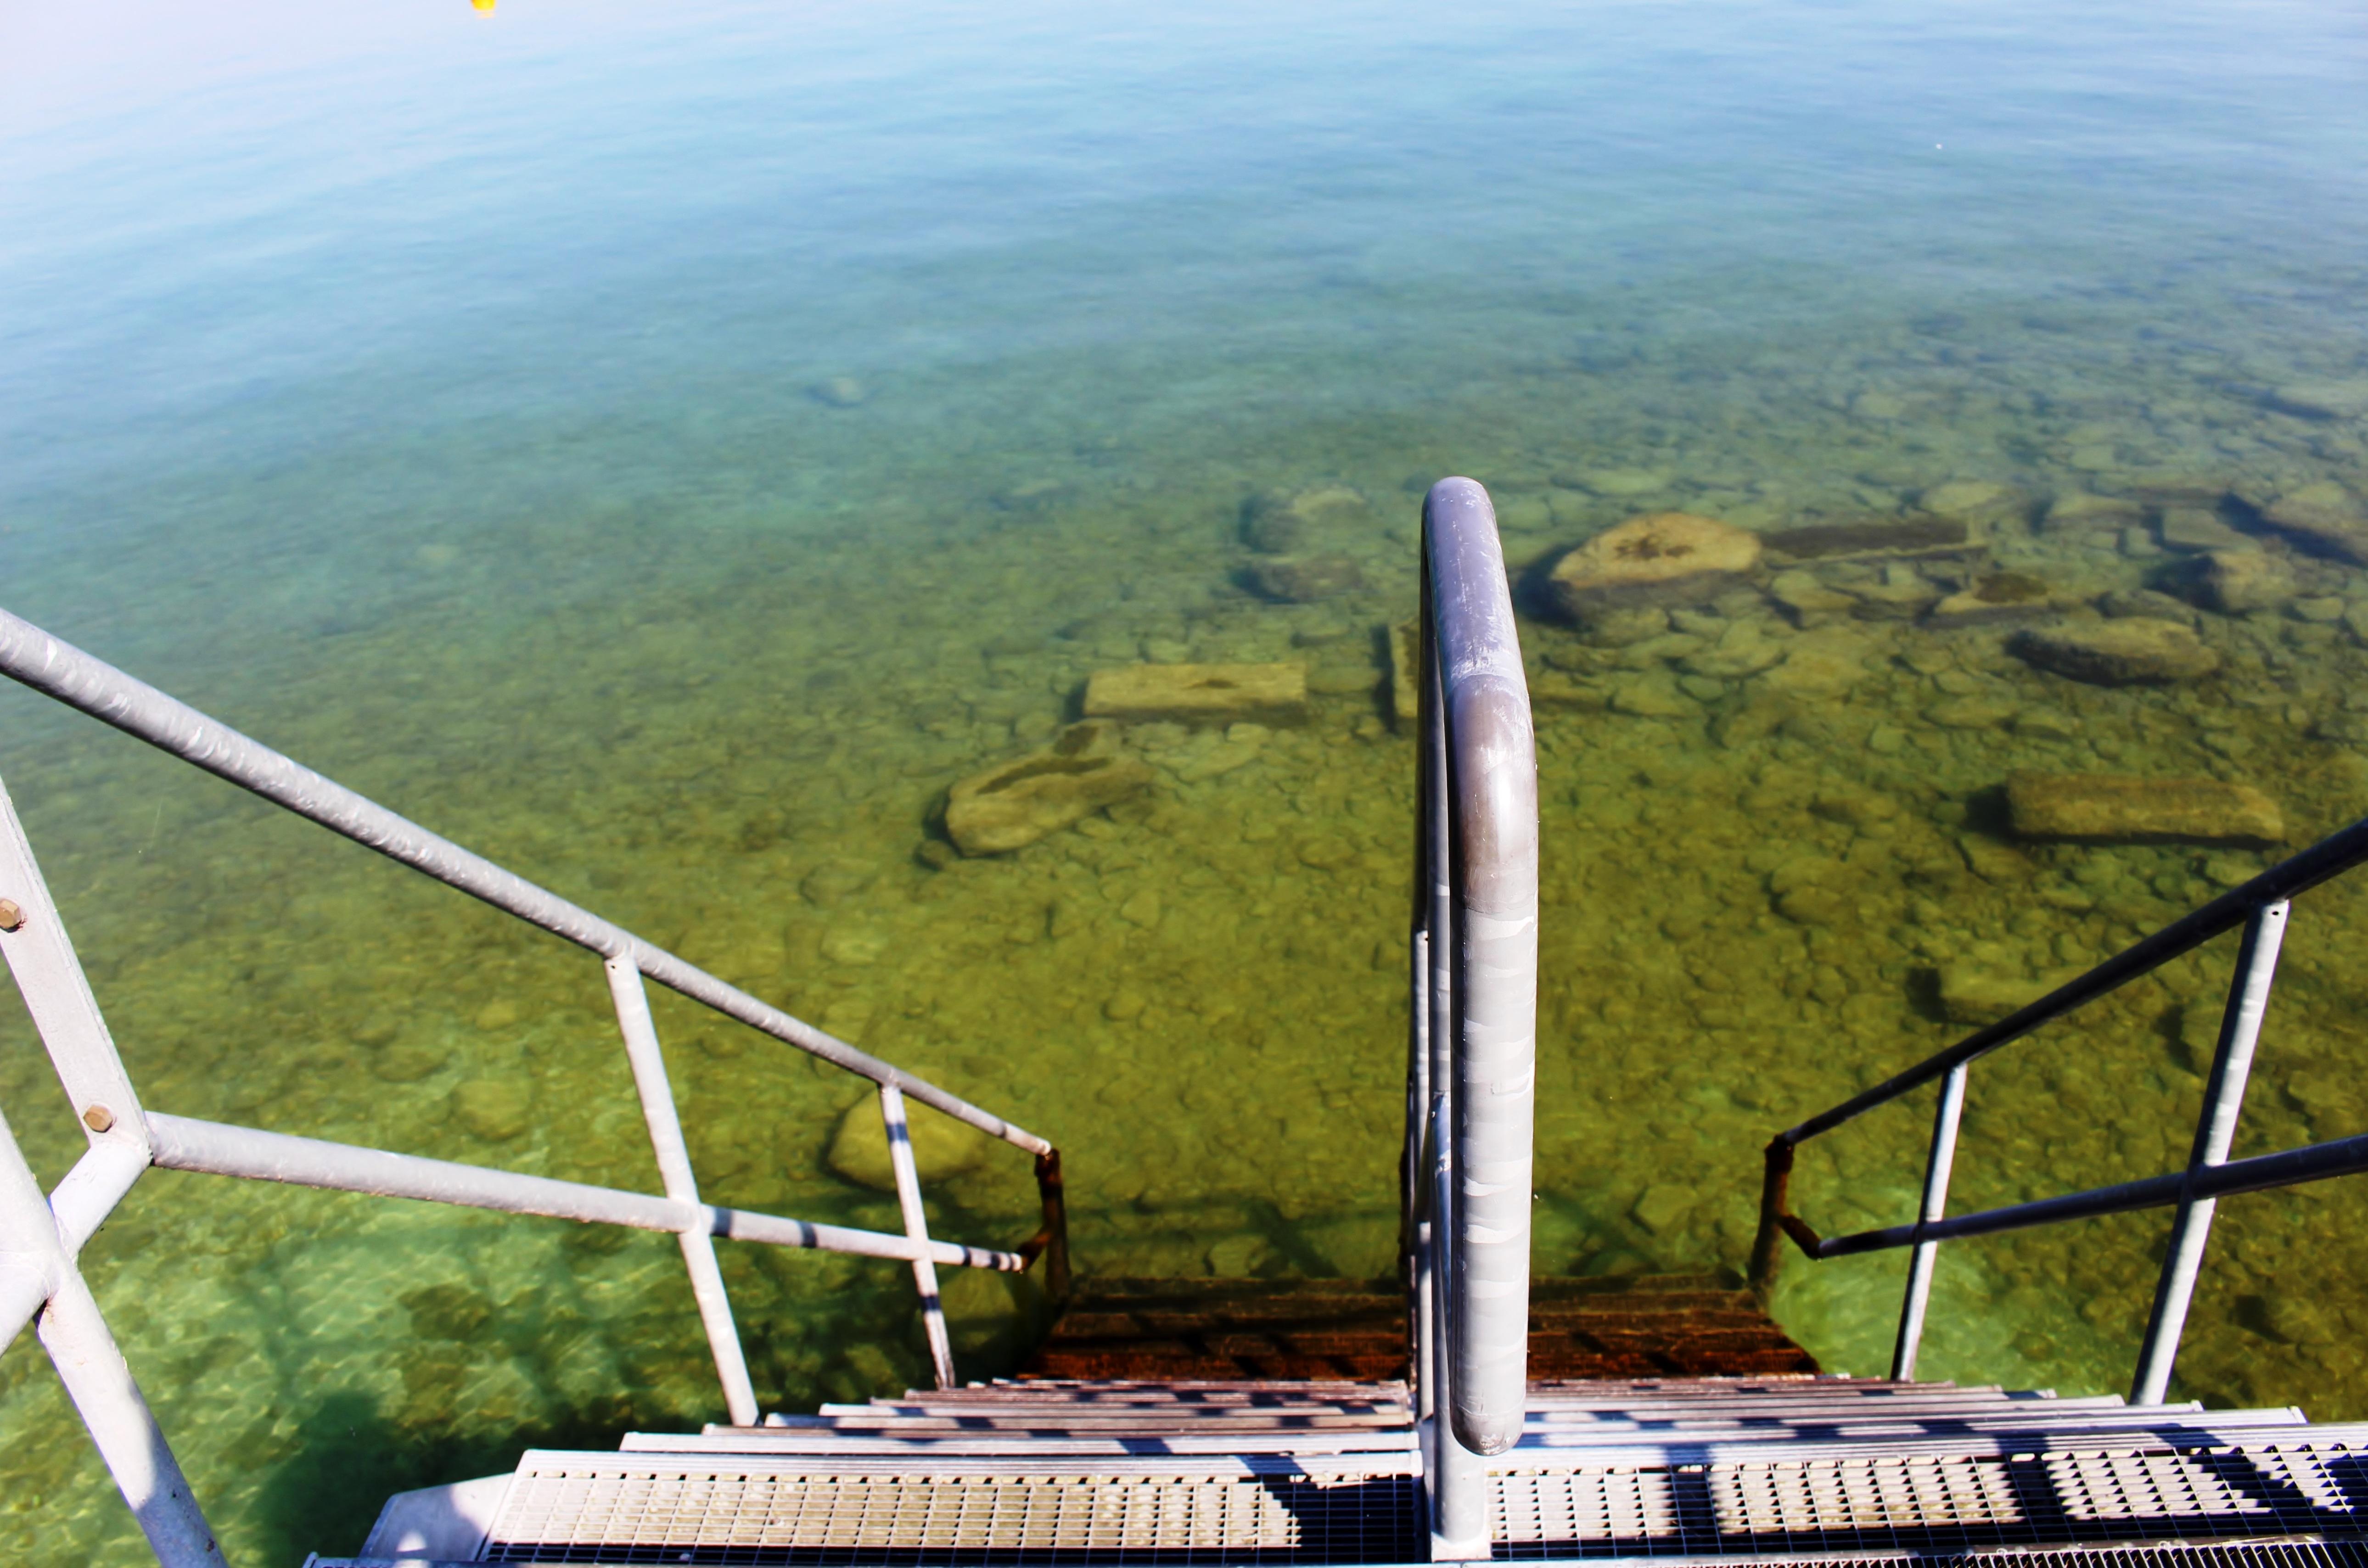 Fotos gratis : mar, costa, agua, lago, viento, vehículo, vuelo ...